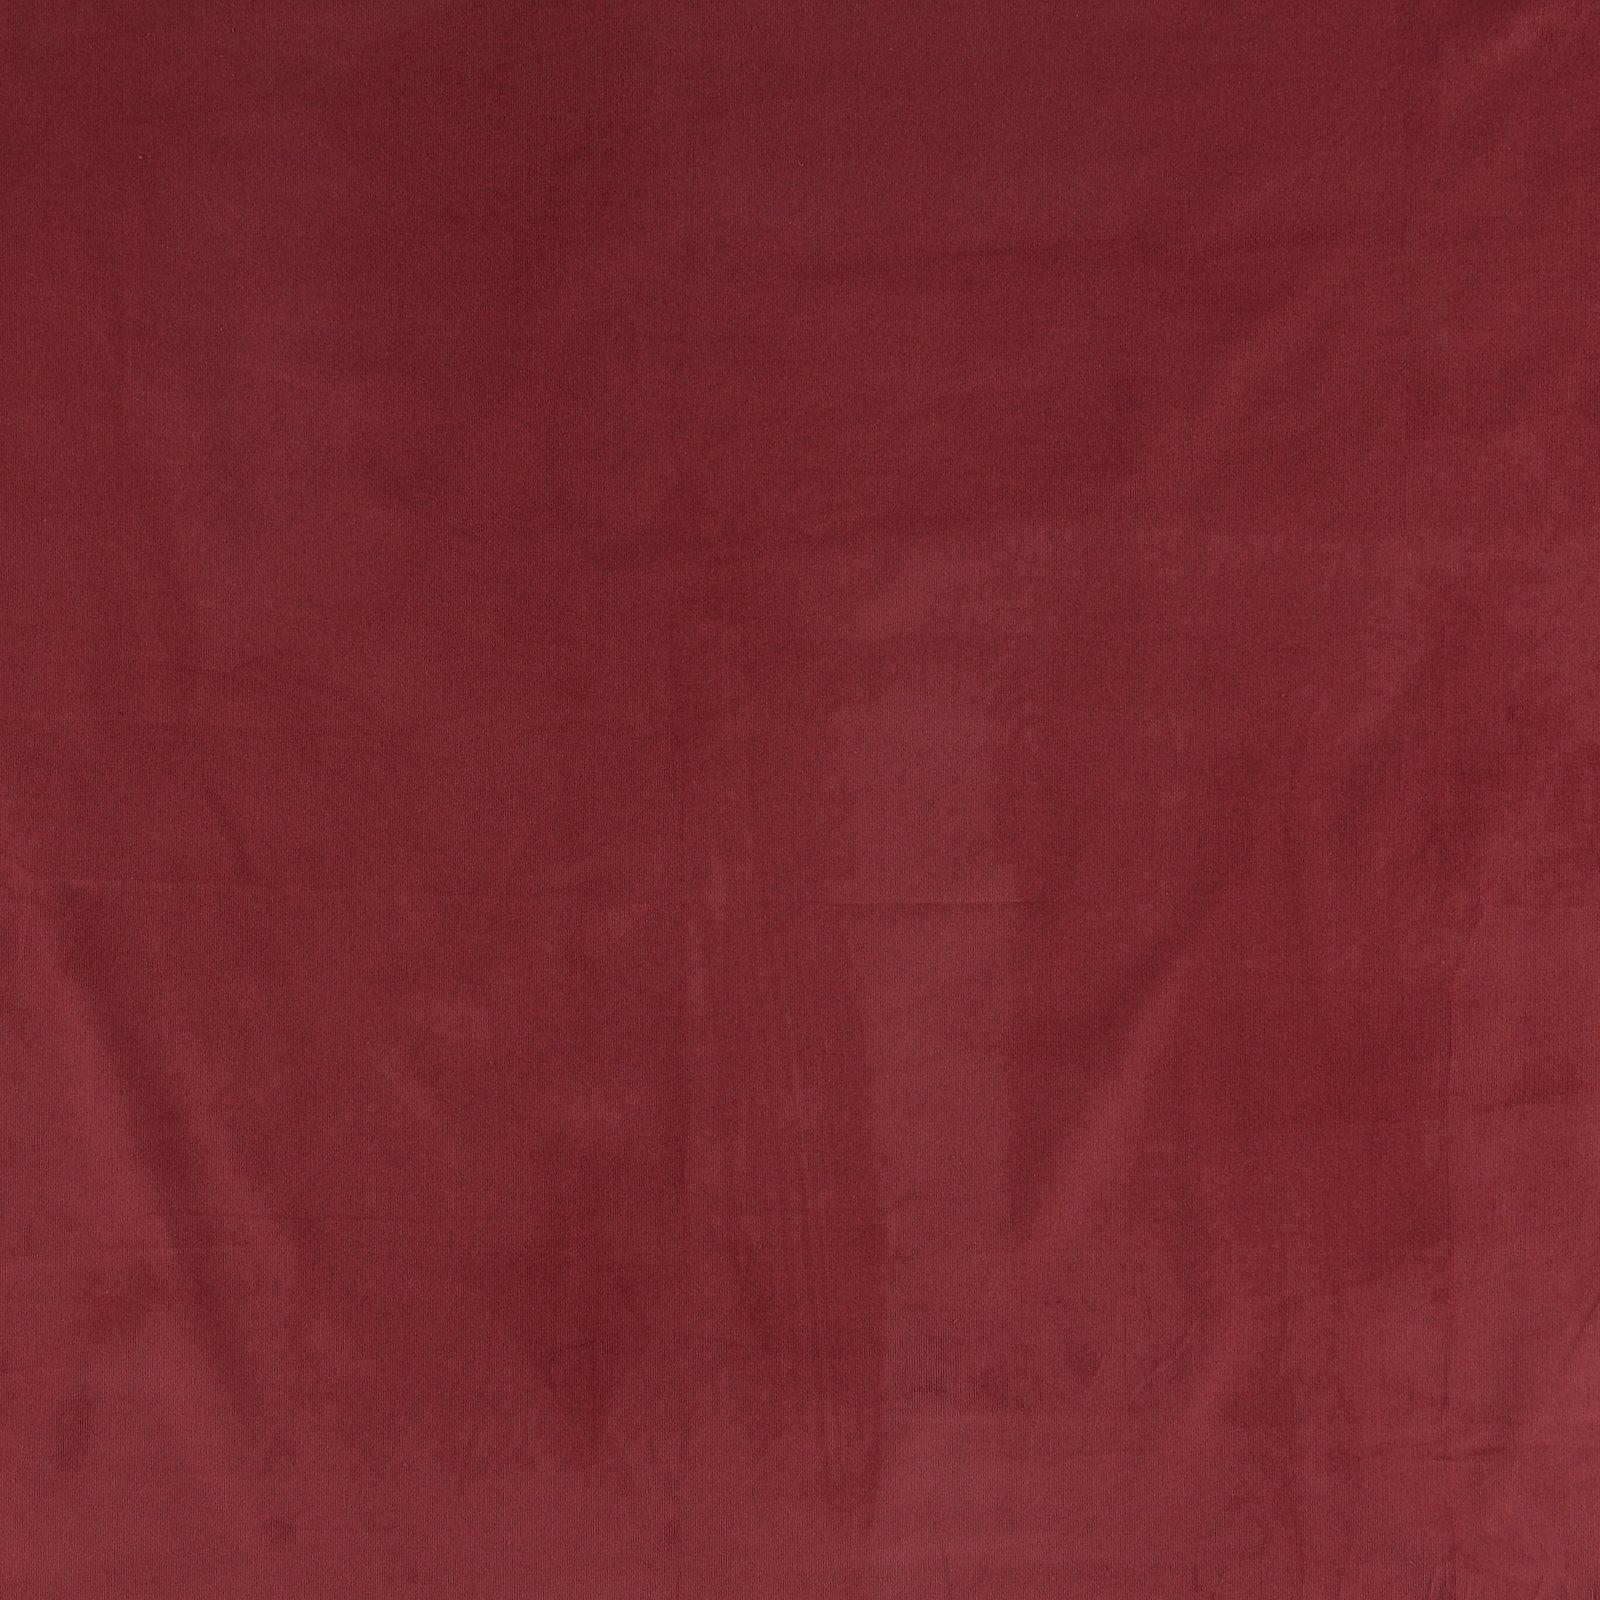 Corduroy 21 wales raspberry 430813_pack_solid